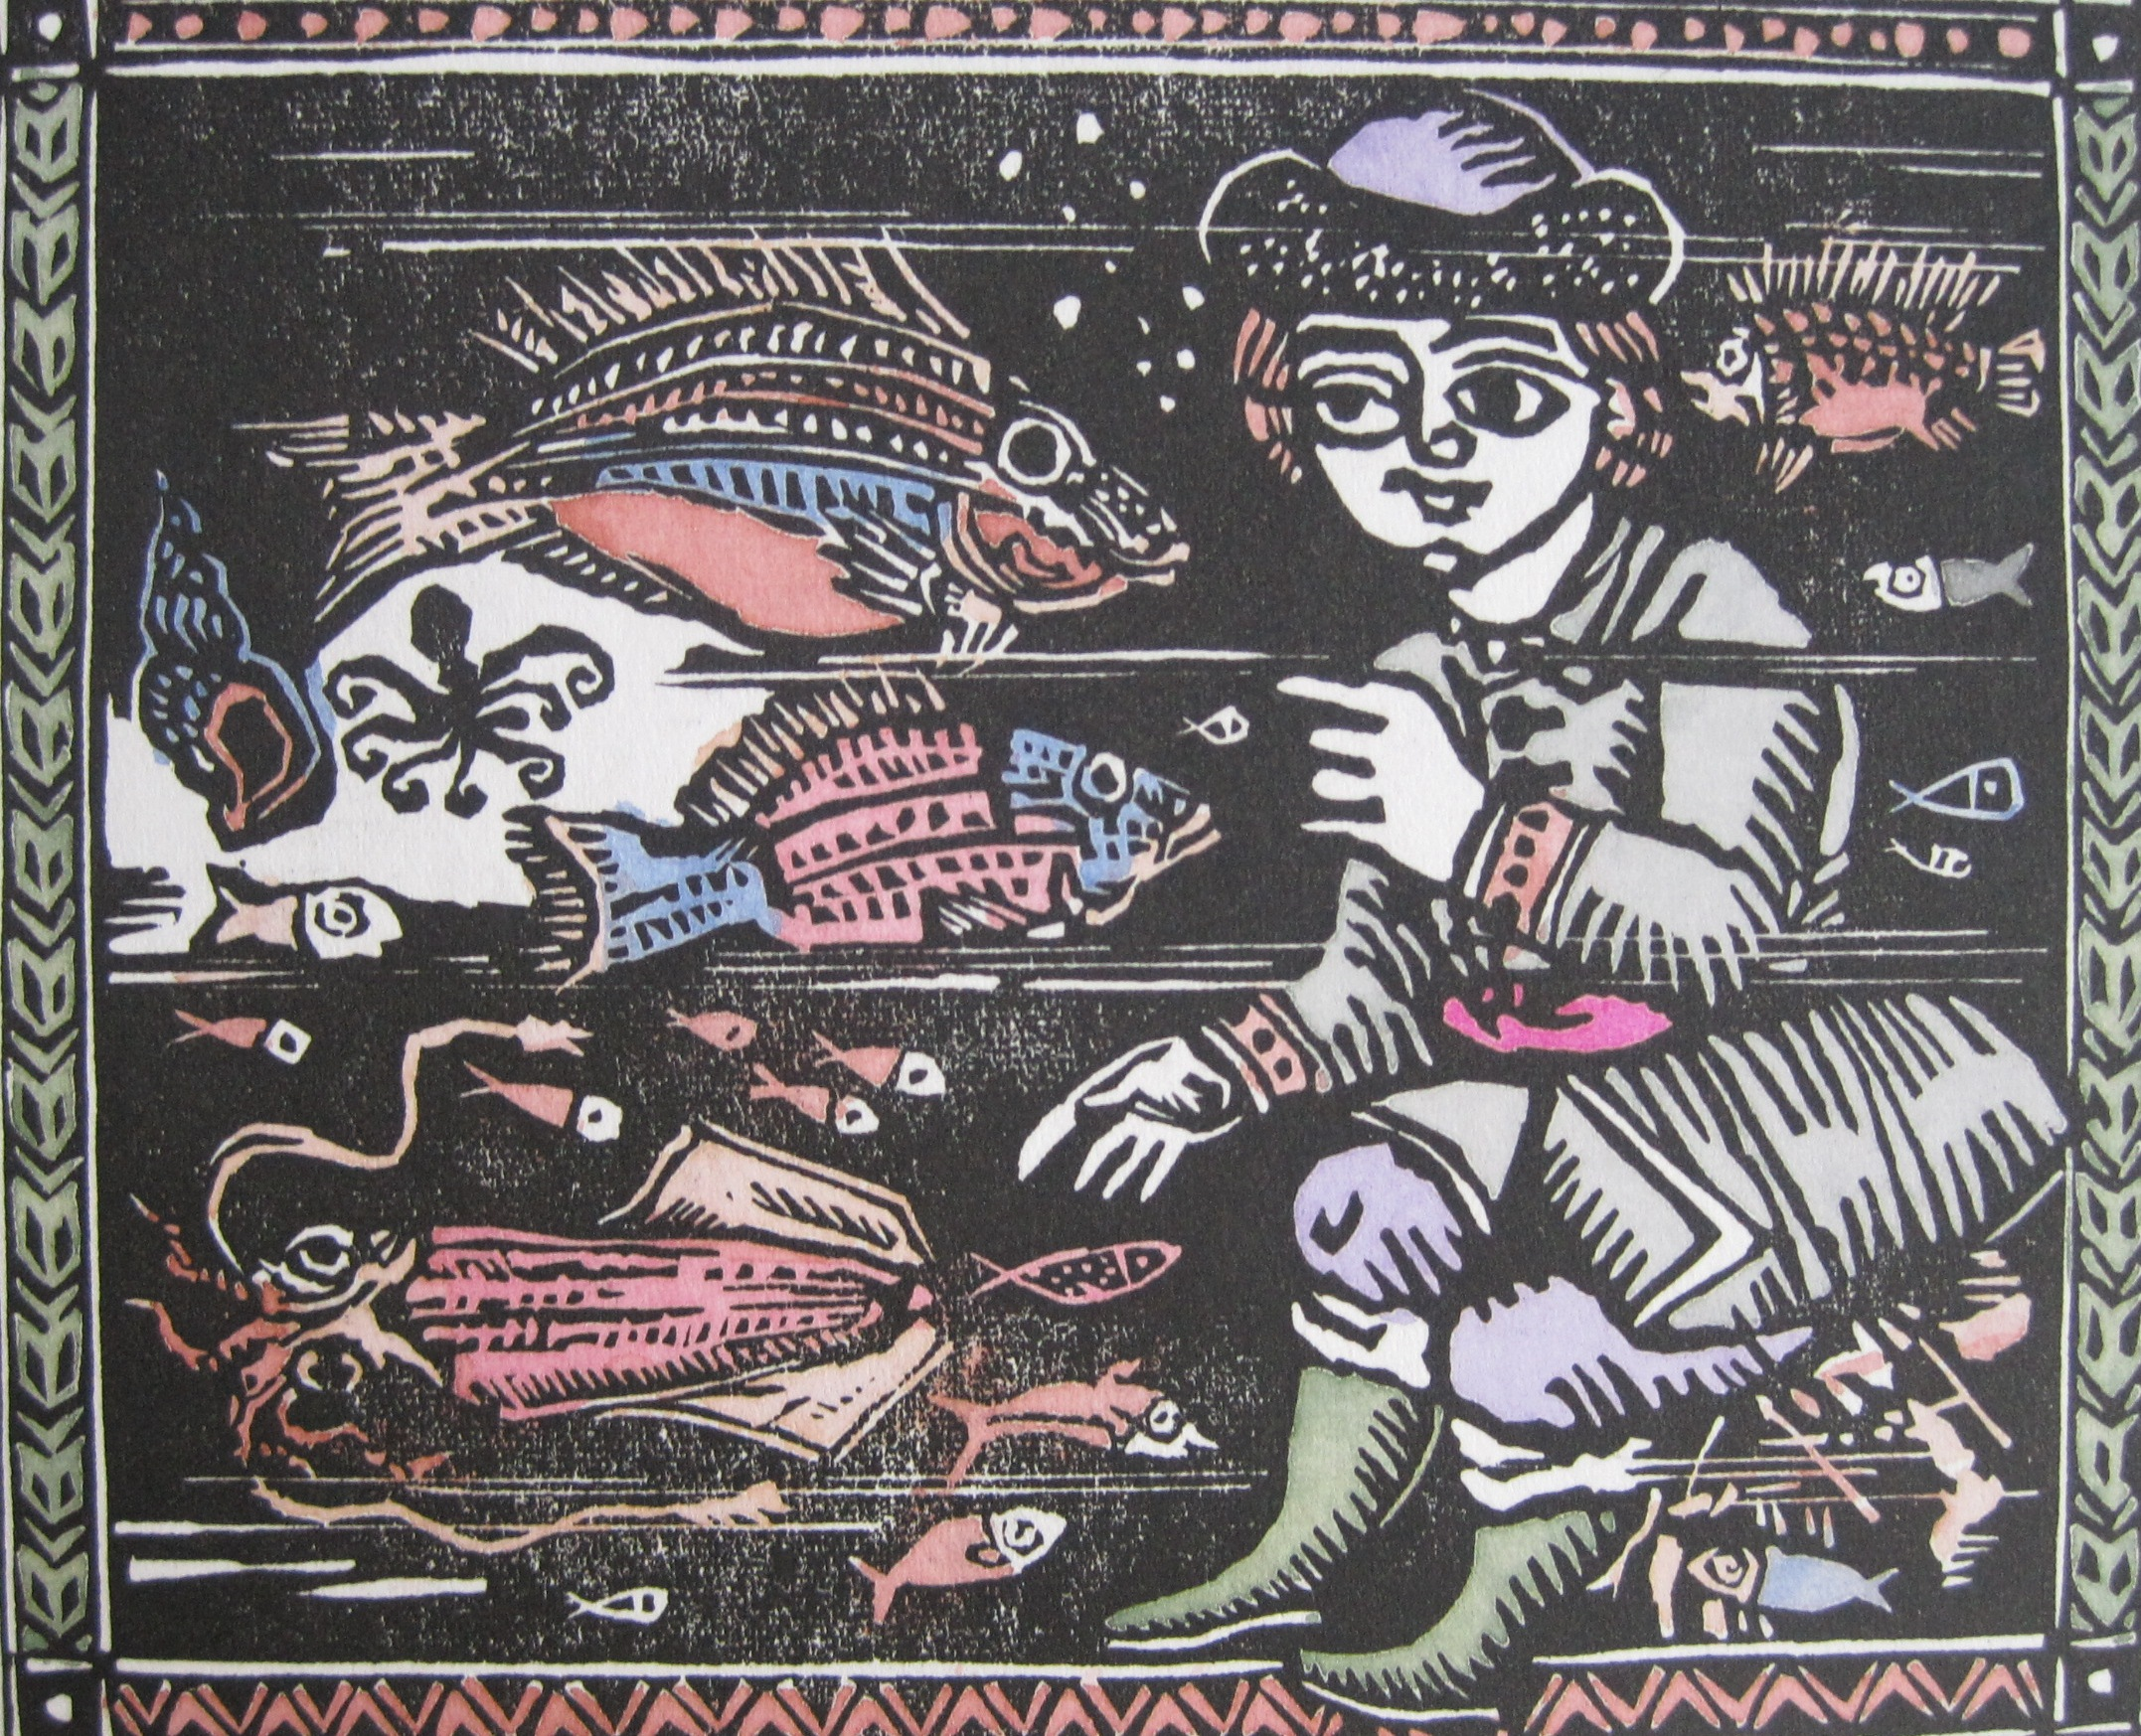 Gyulai, Líviusz: Illustration VI.